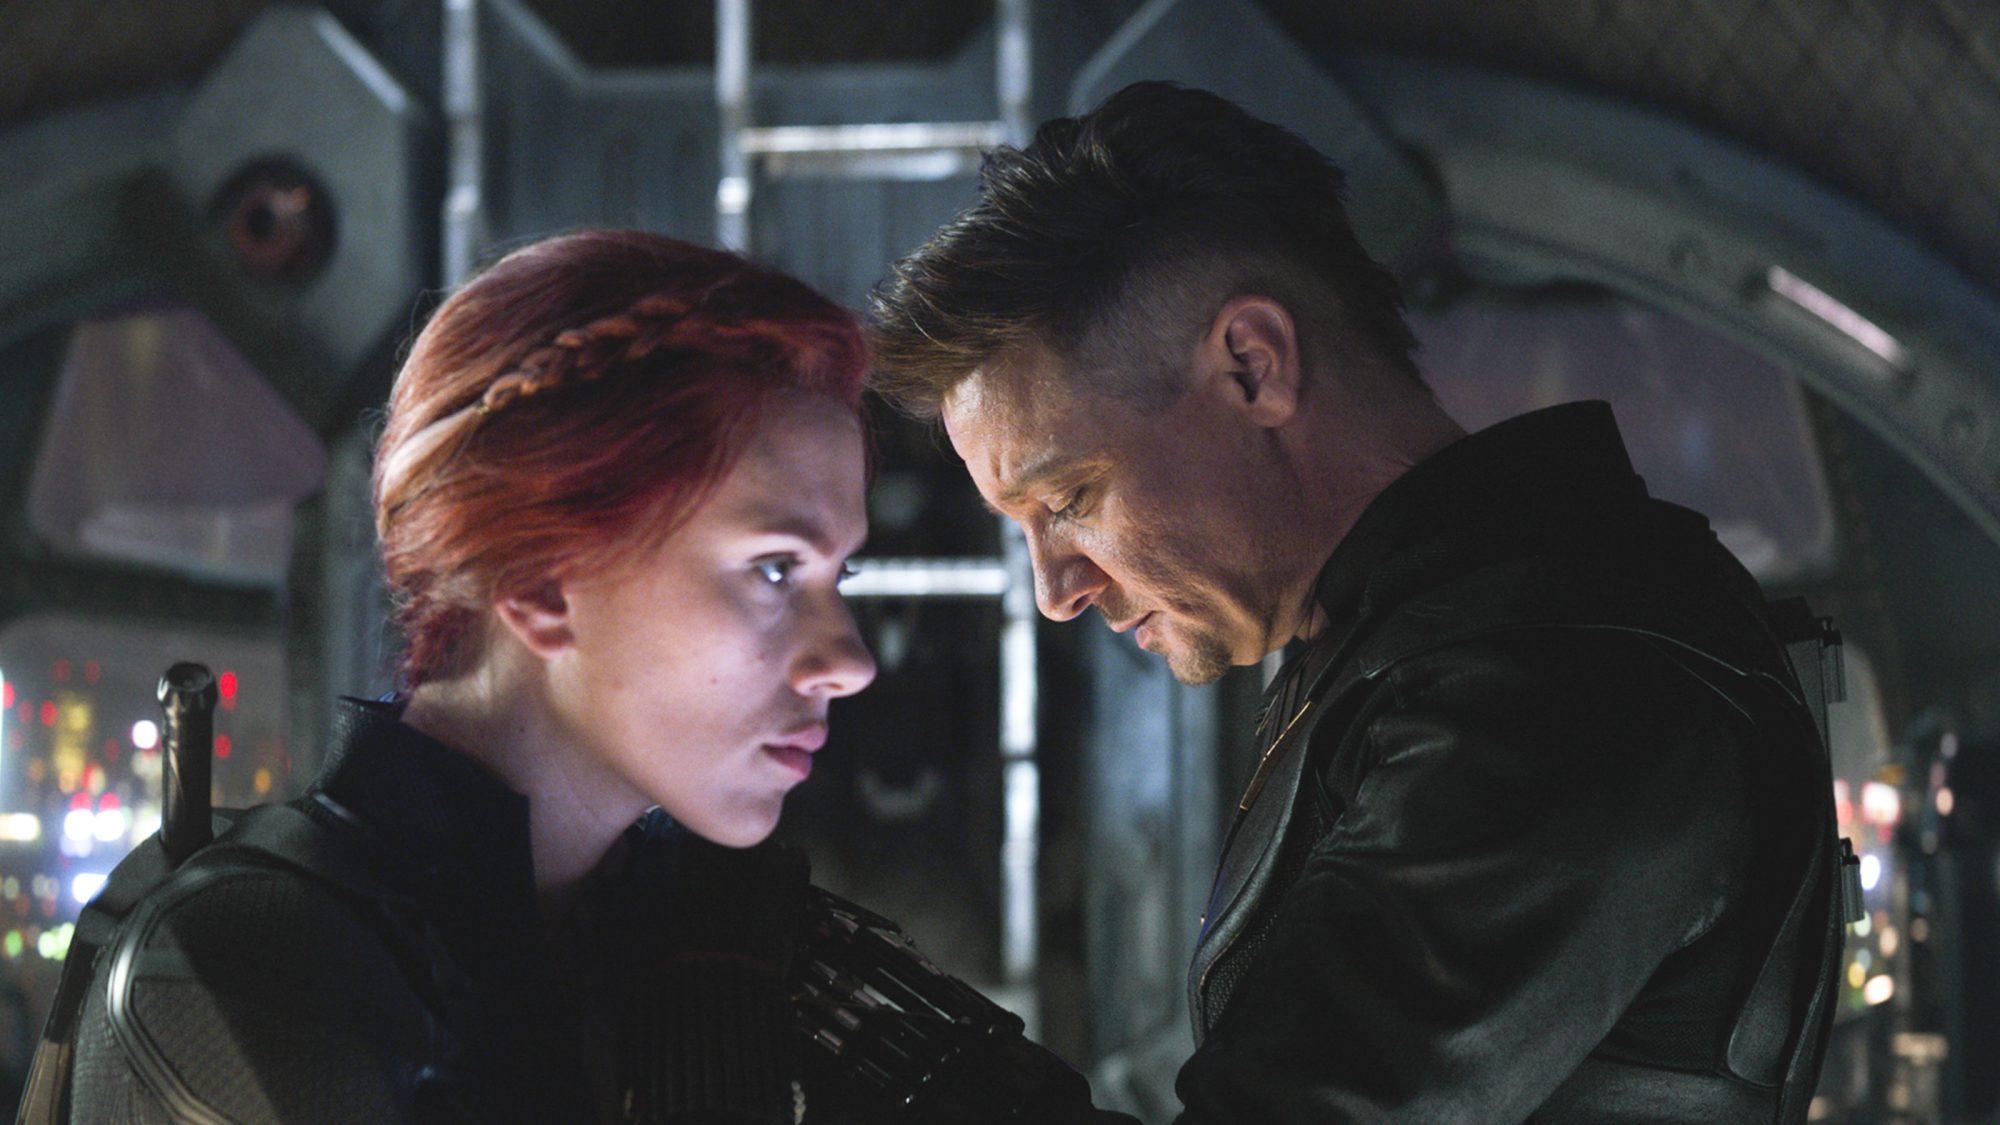 Marvel Studios' AVENGERS: ENDGAME Black Widow/Natasha Romanoff (Scarlett Johansson), Hawkeye/Clint Barton (Jeremy Renner)..Photo: Film Frame..©Marvel Studios 2019